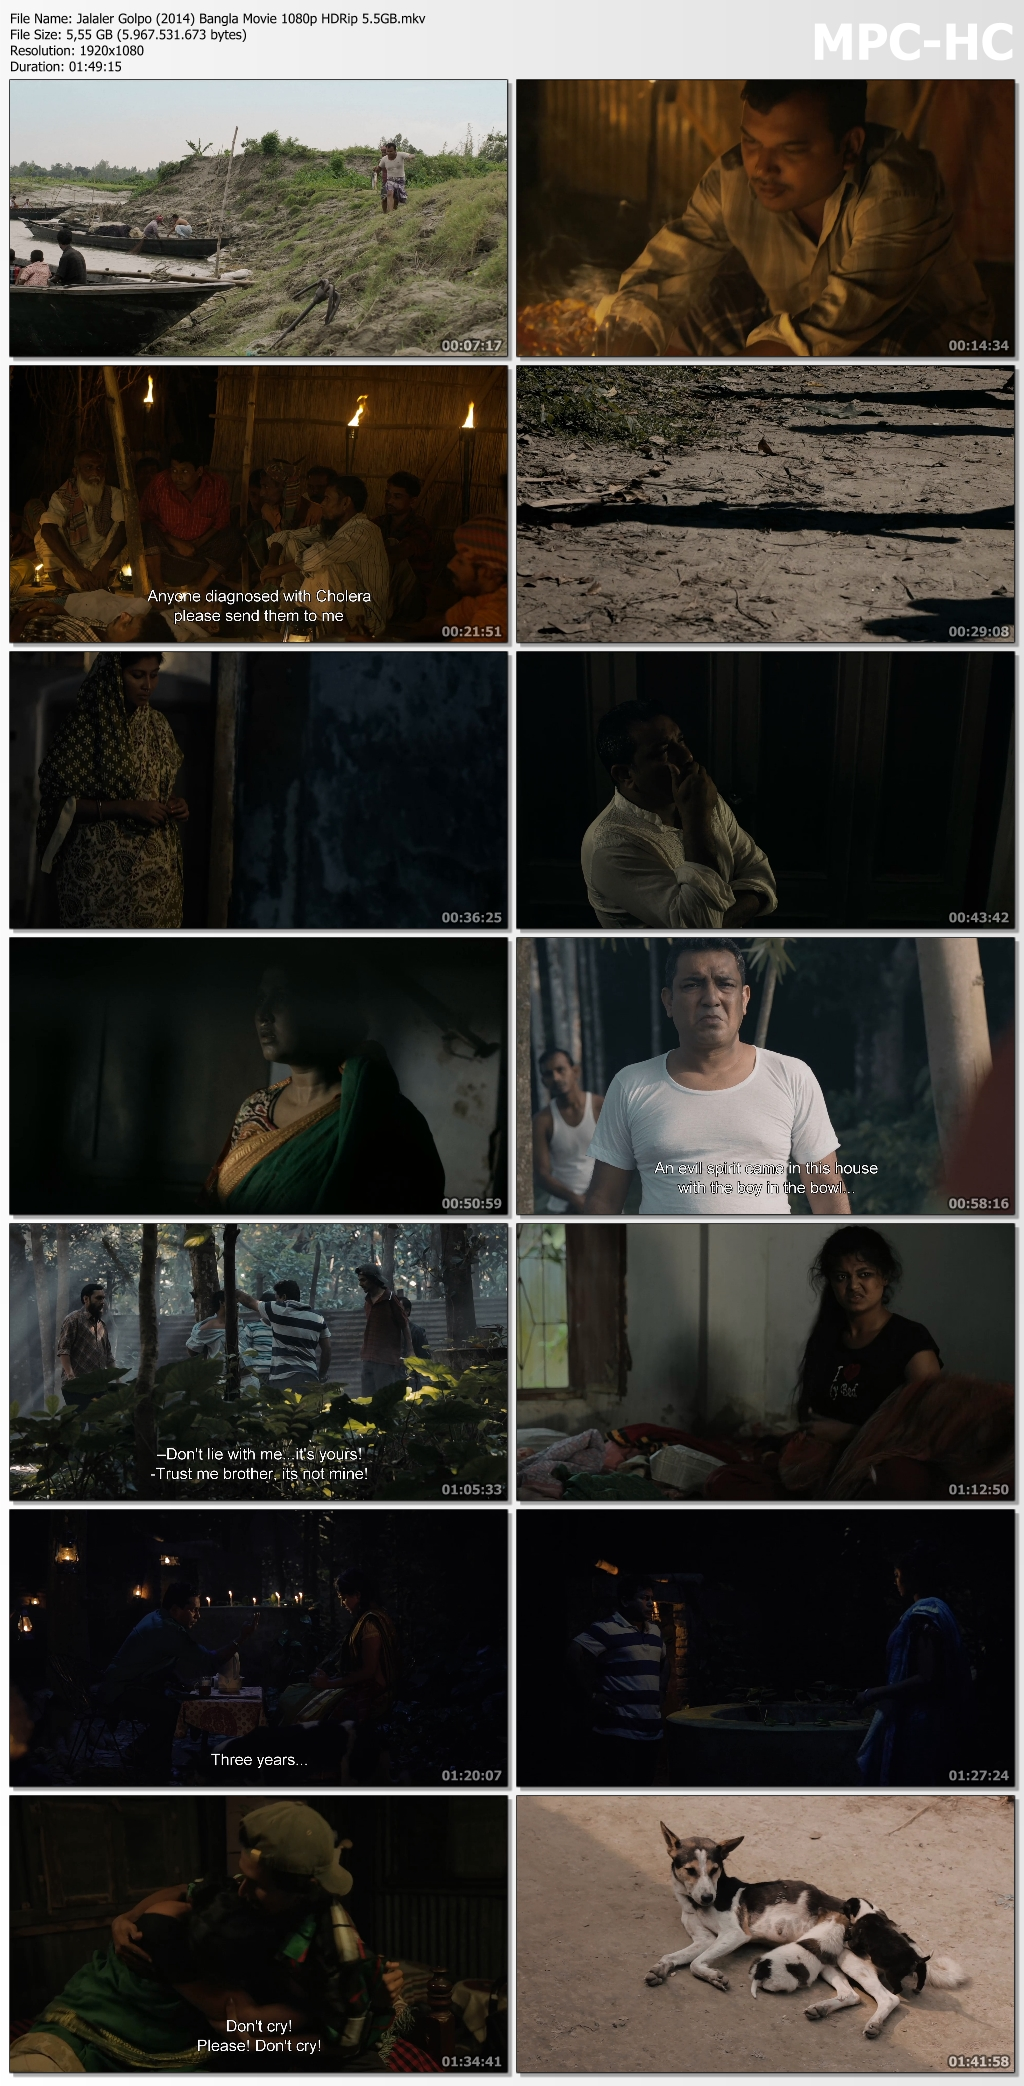 Jalaler-Golpo-2014-Bangla-Movie-1080p-HDRip-5-5-GB-mkv-thumbs